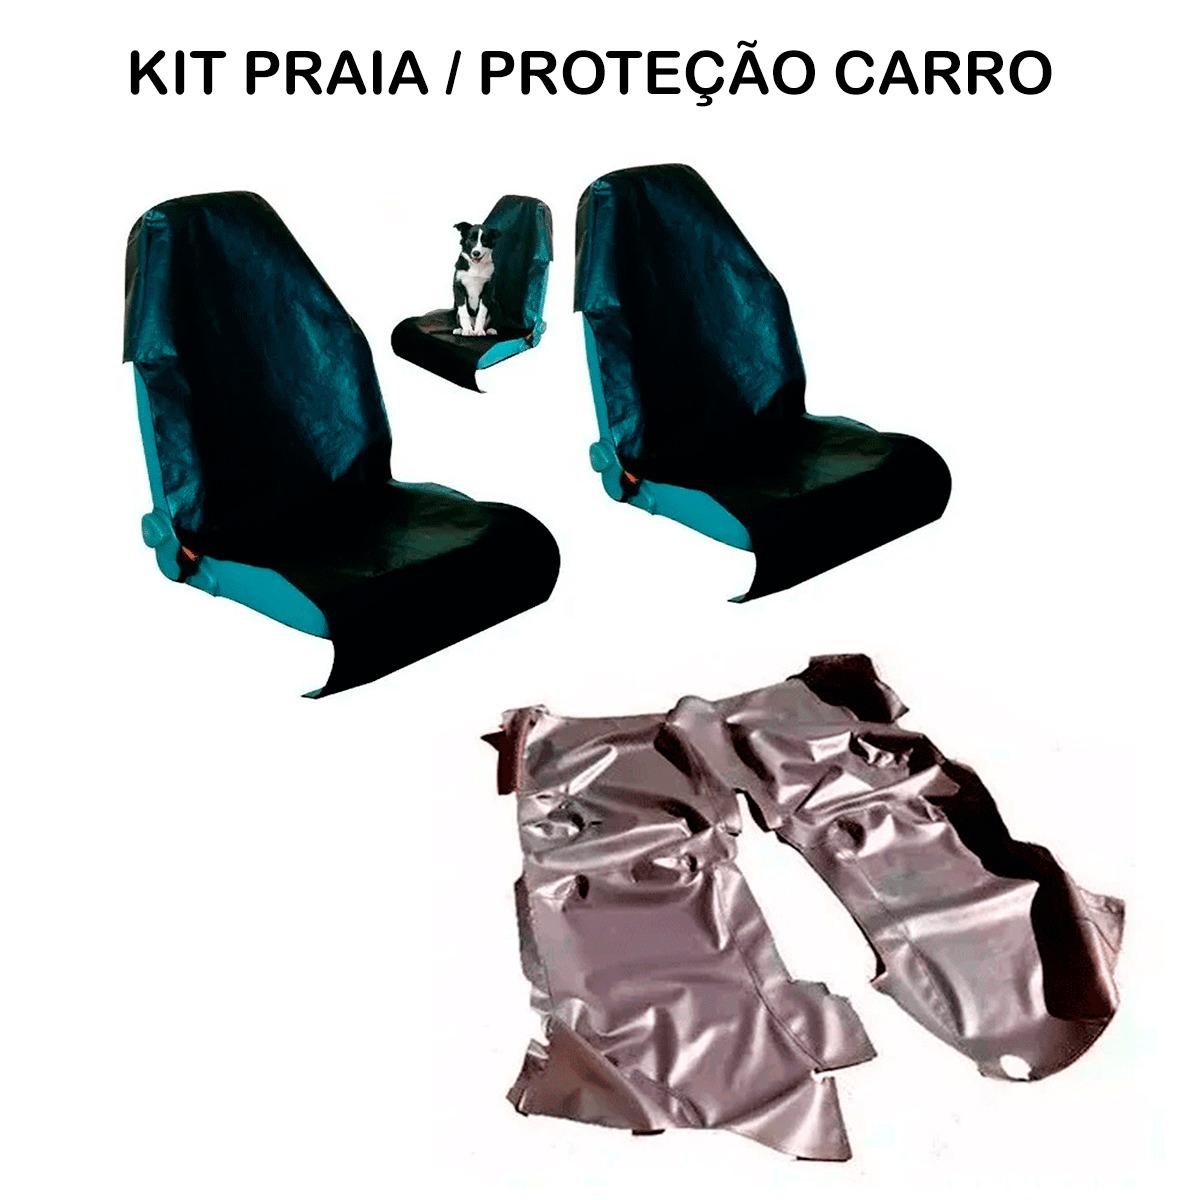 Tapete Em Vinil Fiat Strada Simples todos + Capa Banco Protecao Banco Areia Suor Academia